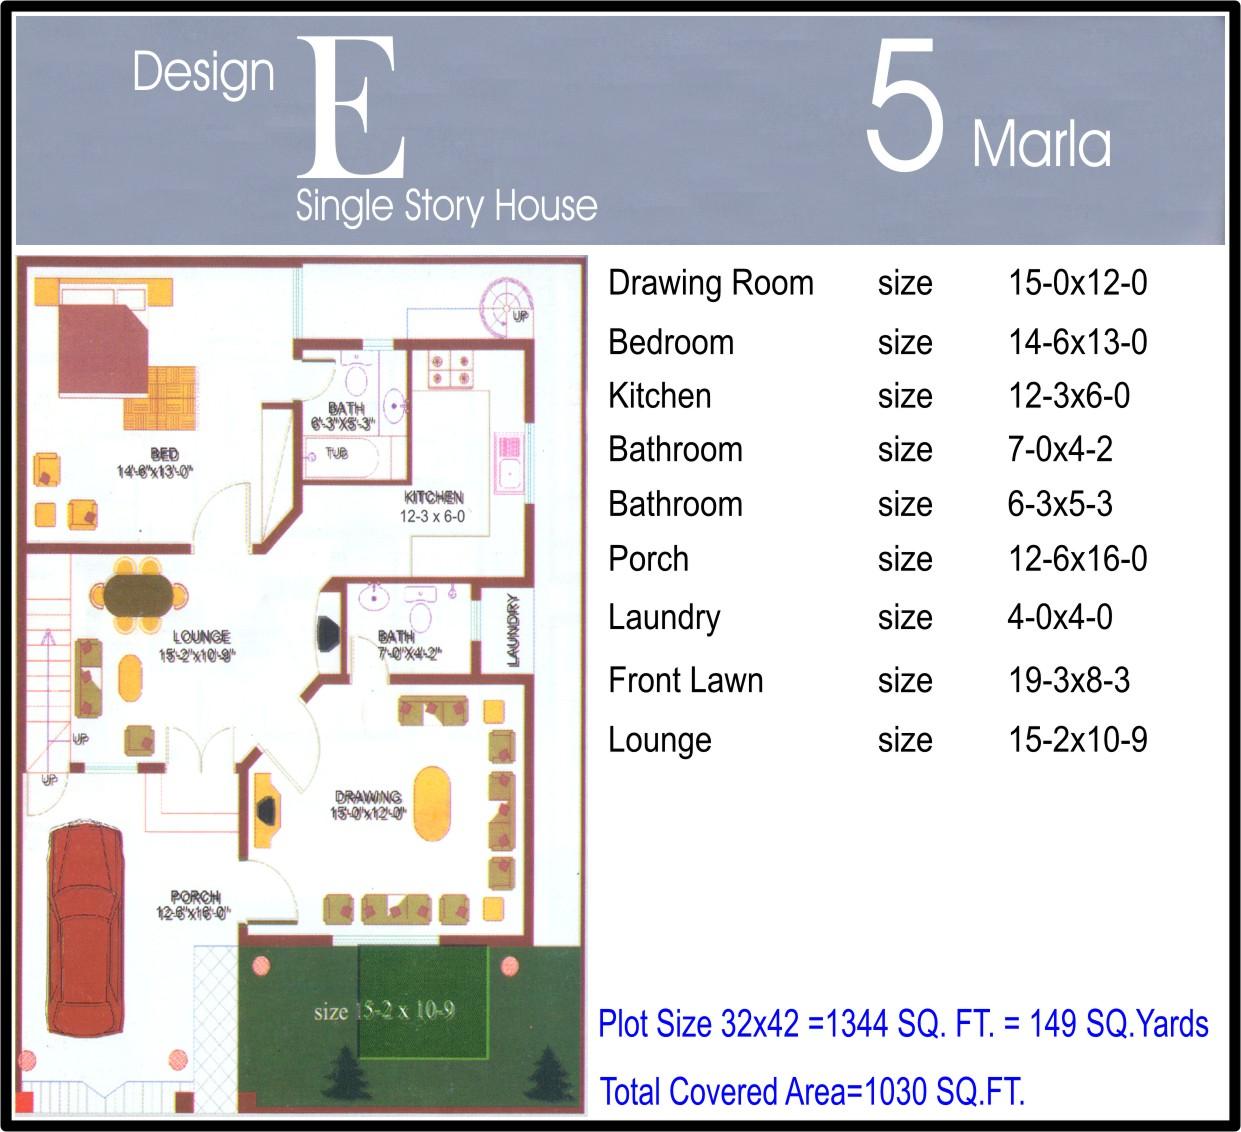 Marla house Plans - Civil Engineers PK